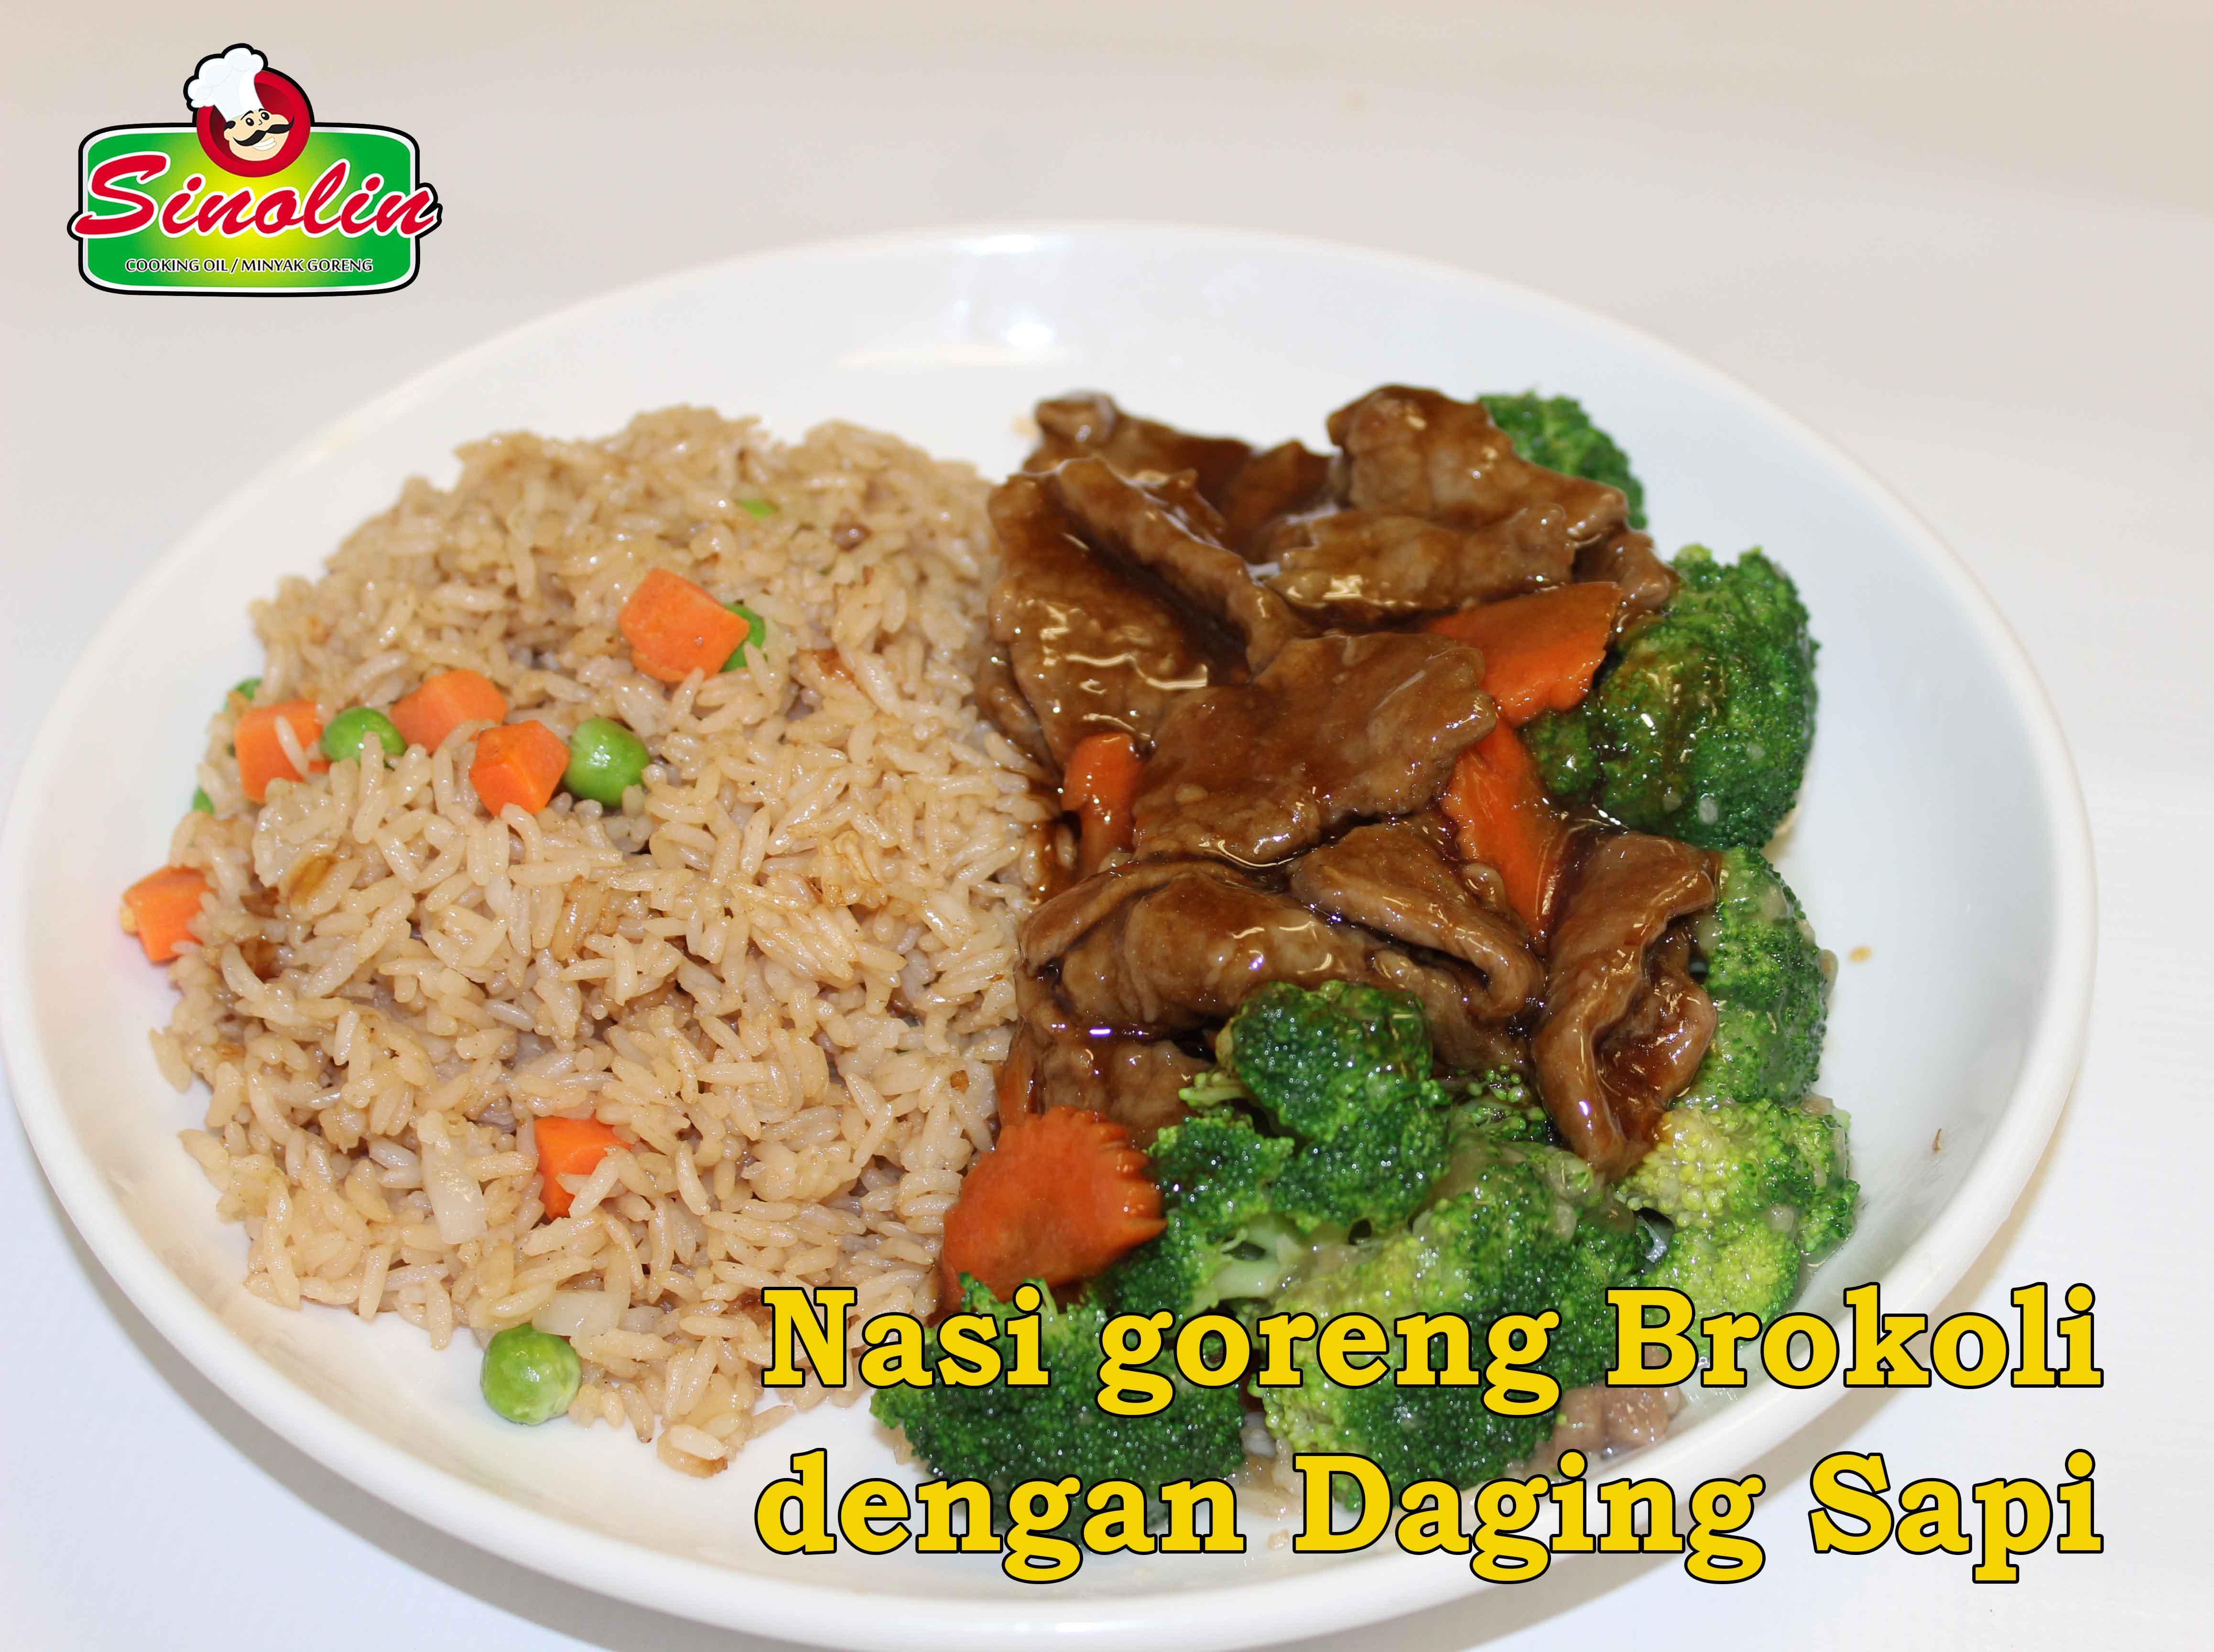 Nasi Goreng Brokoli dengan Daging Sapi Oleh Dapur Sinolin